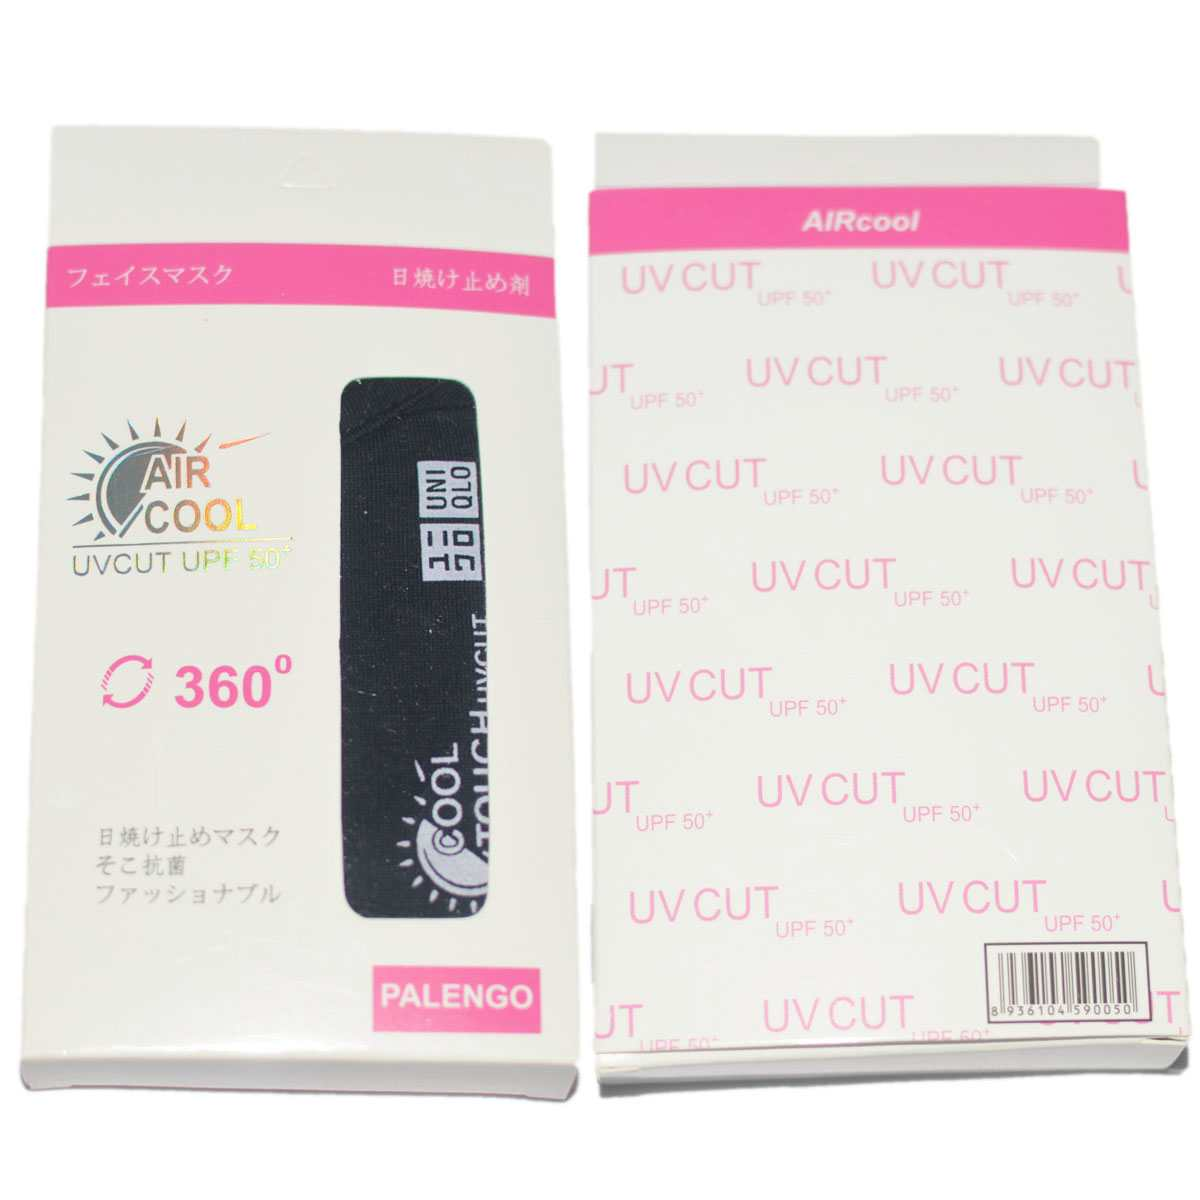 Khẩu trang chống nắng Aircool UV Cut